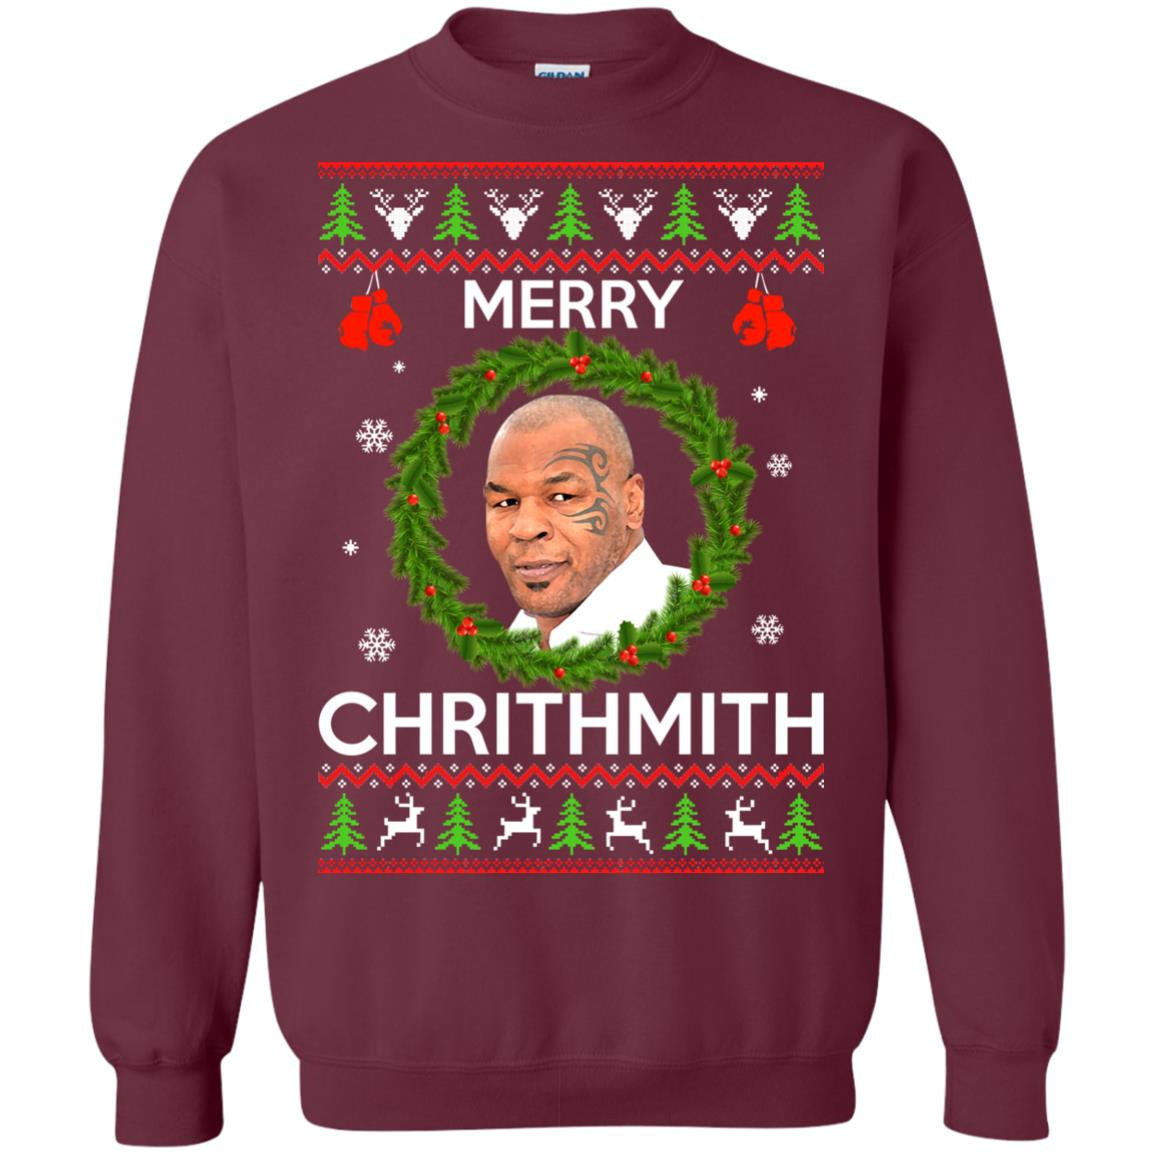 image 842px Mike Tyson Christmas Sweater Merry Chrithmith Sweatshirt